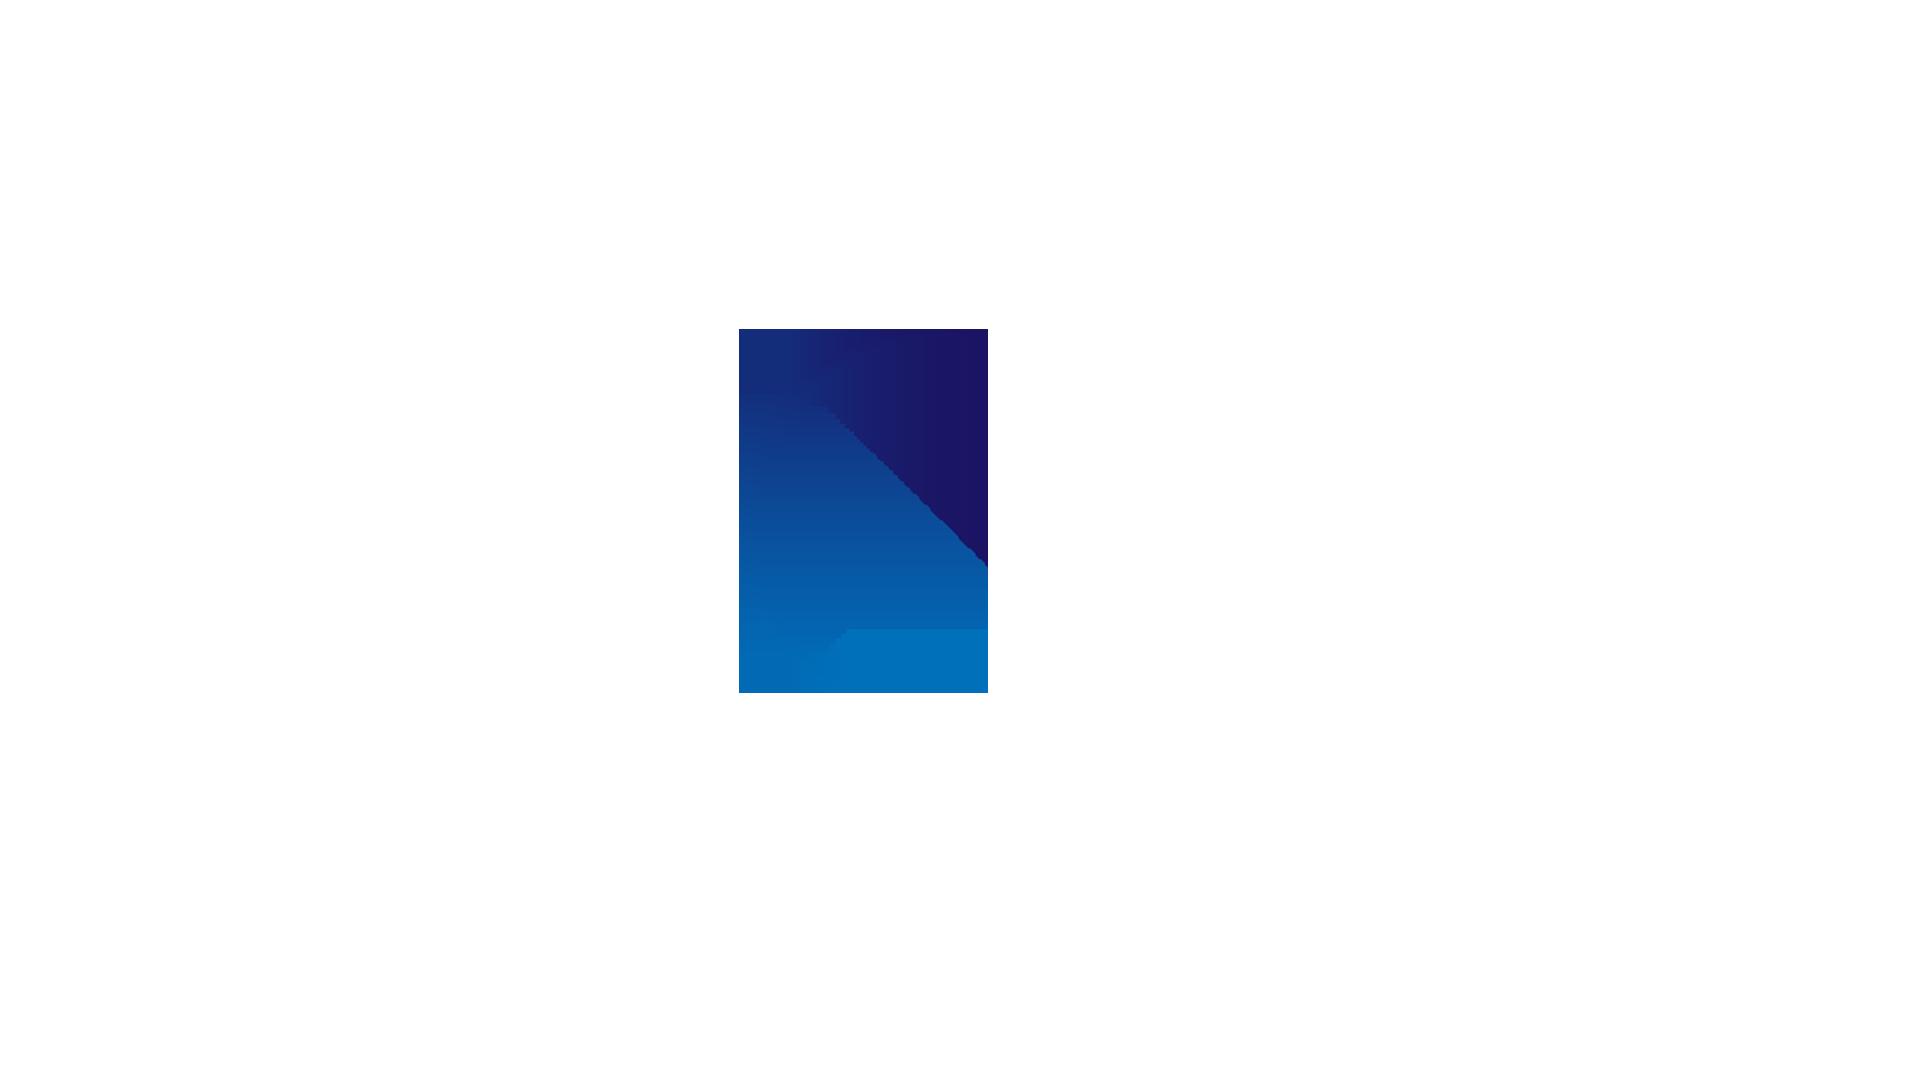 depannage_electricite-electricien_Arles-installation_climatisation-nettoyage_climatisation-pose_climatisation-desinfection_clim-installation_pompe_a_chaleur-installation_chauffe_eau_thermodynamique-devis_electricite